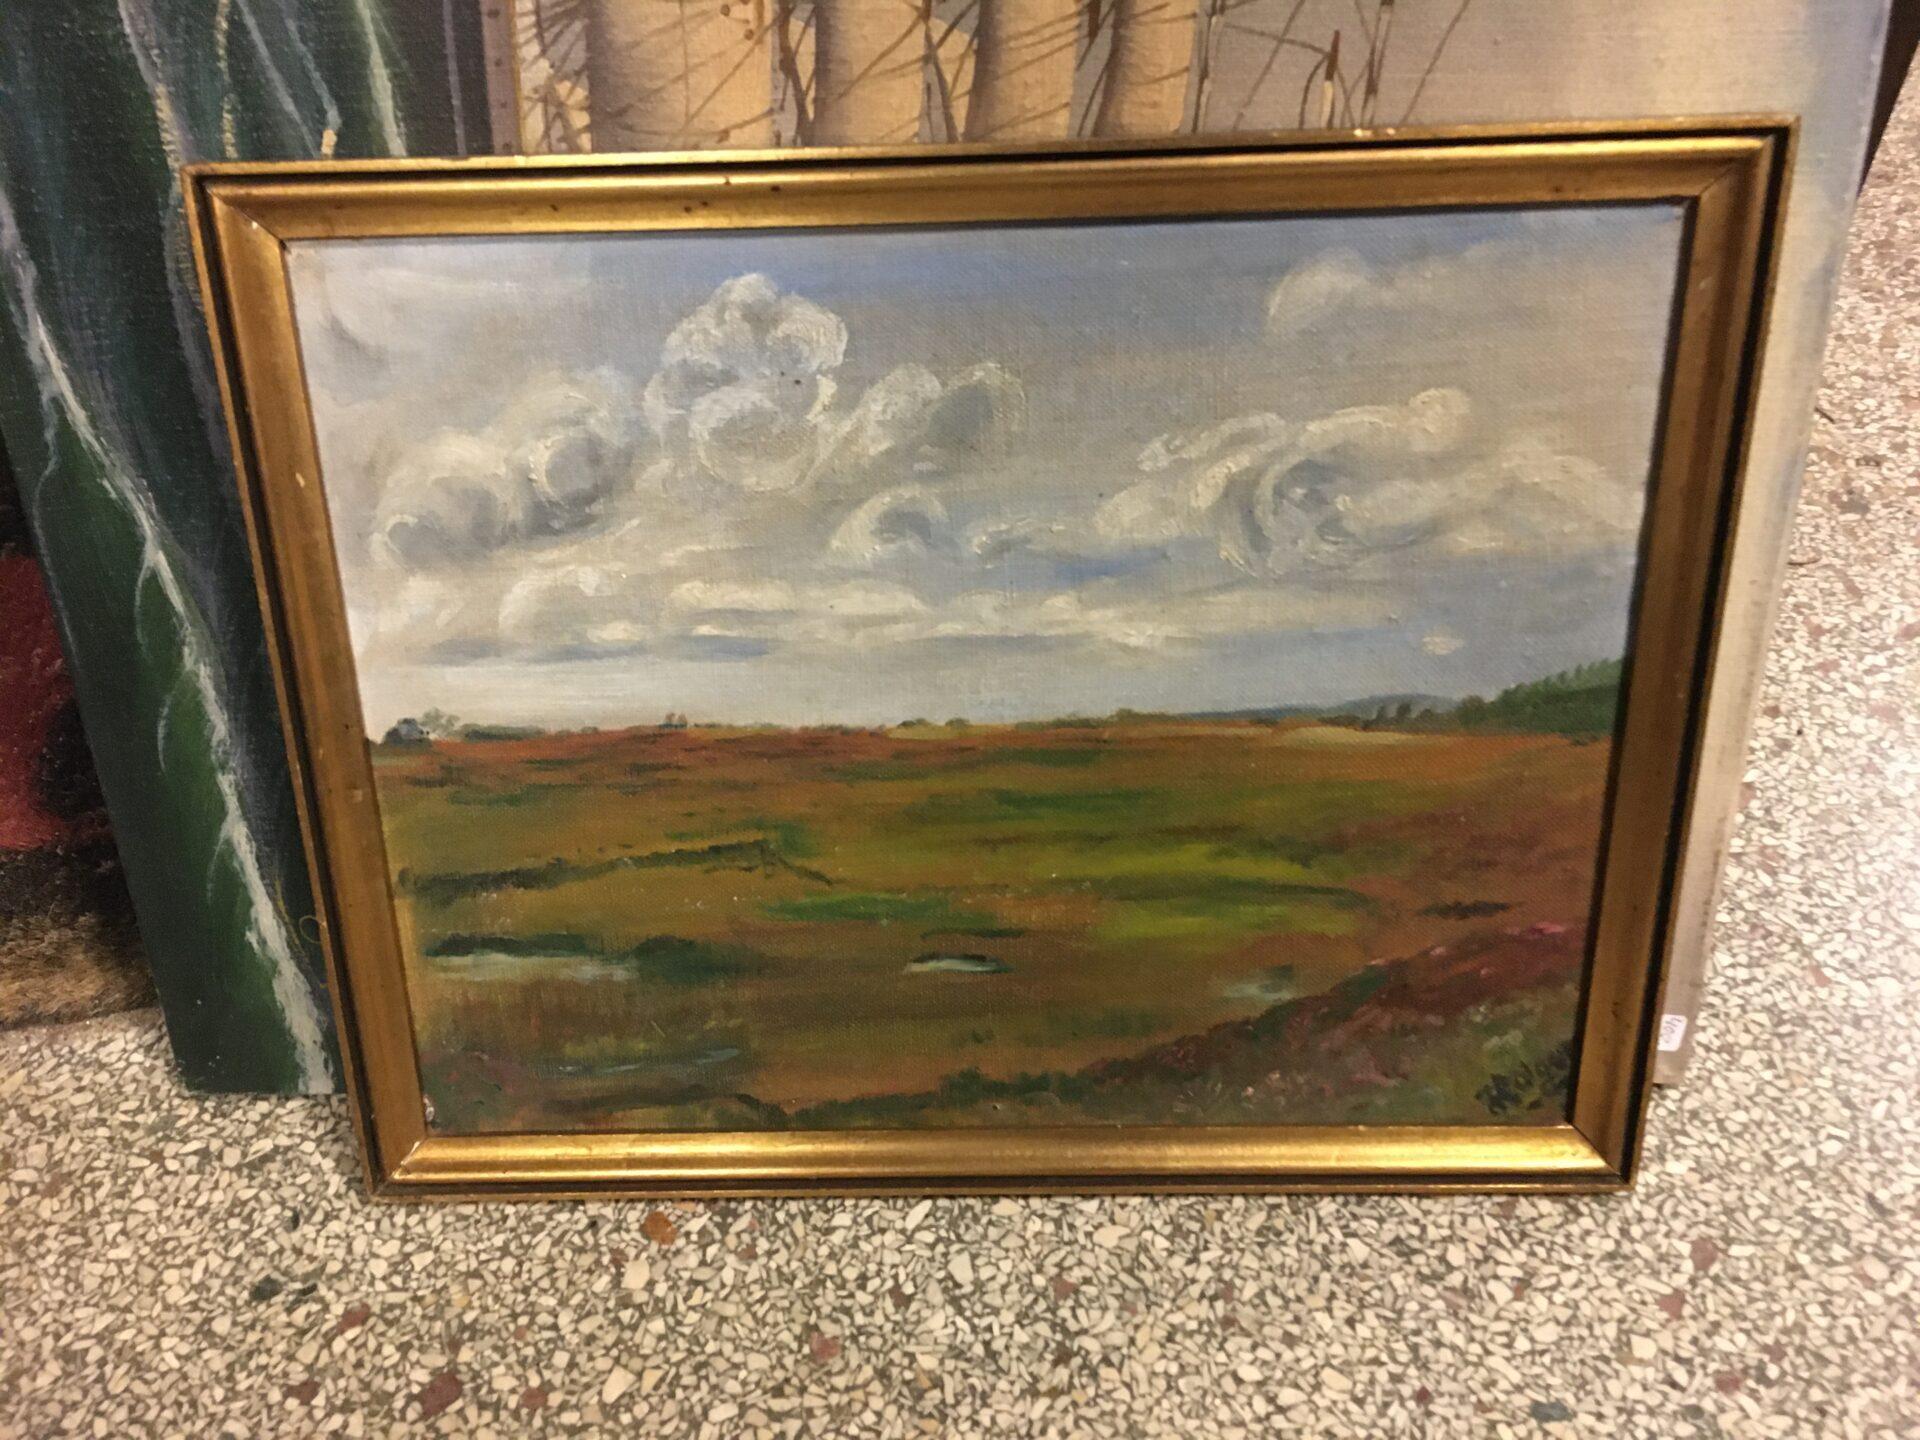 Bjerlev Hede 1940, lille fint maleri, pris 200 kr